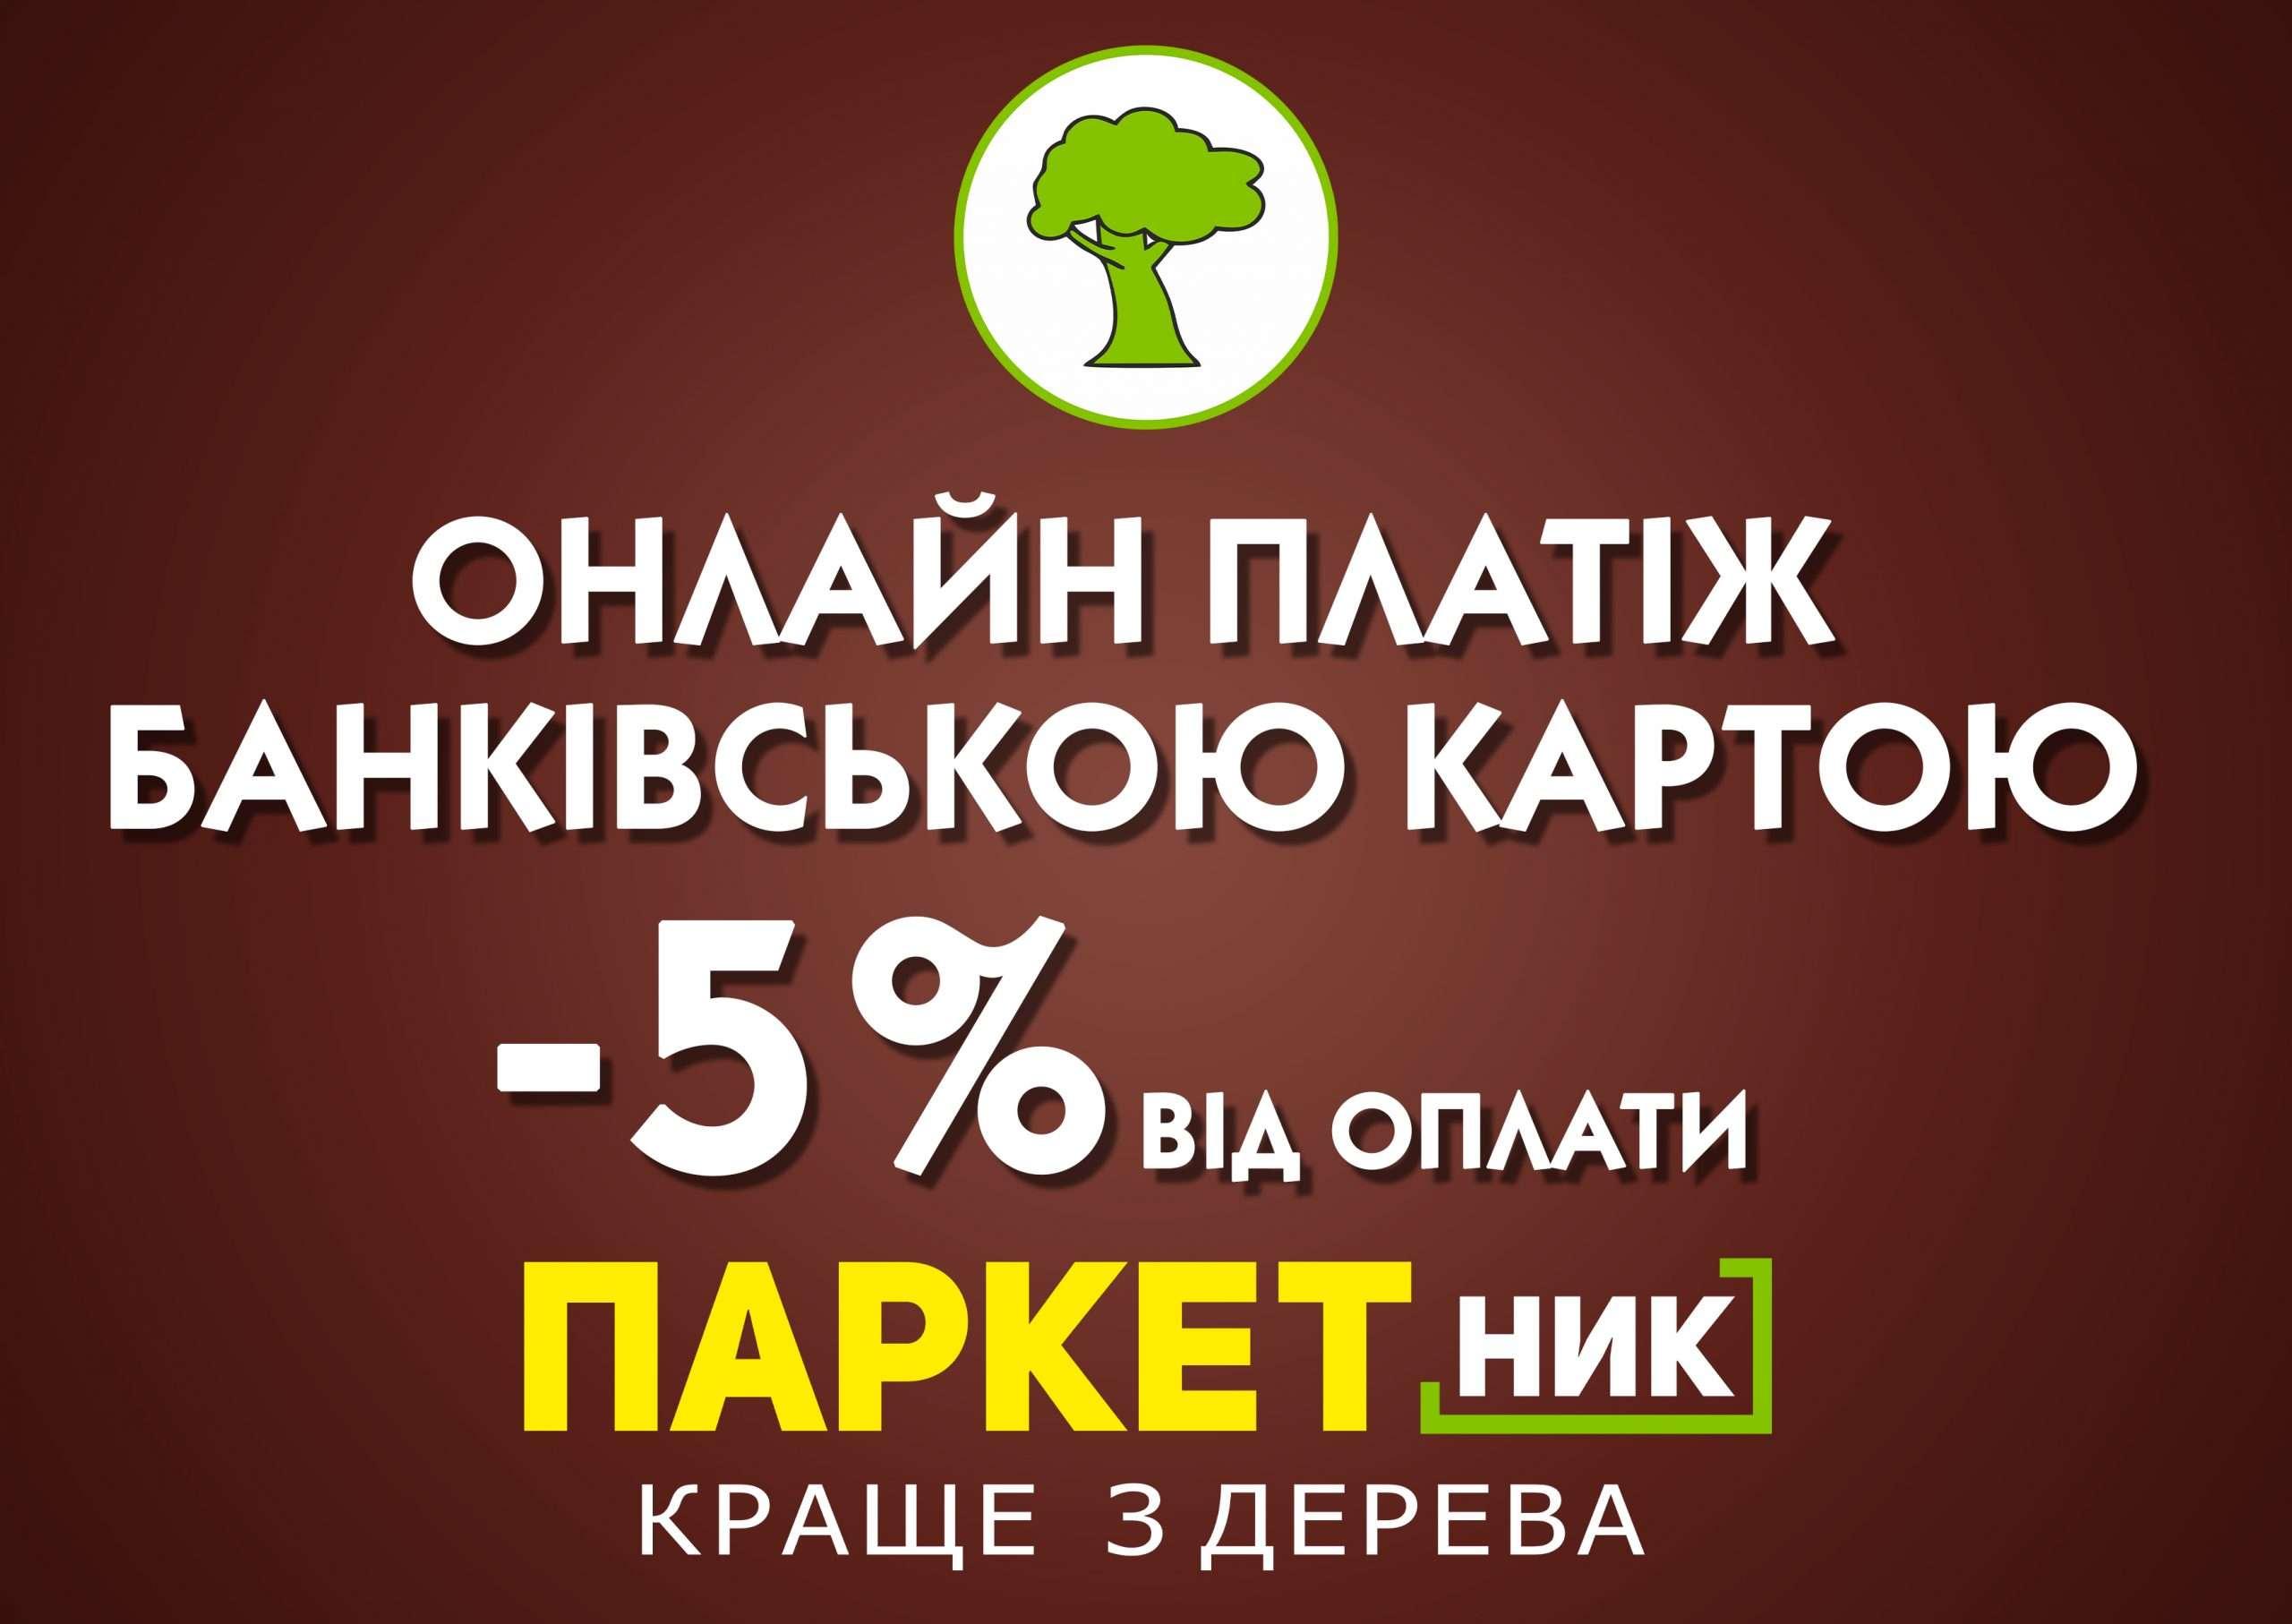 Скидка 5% при оплате онлайн банковской картой